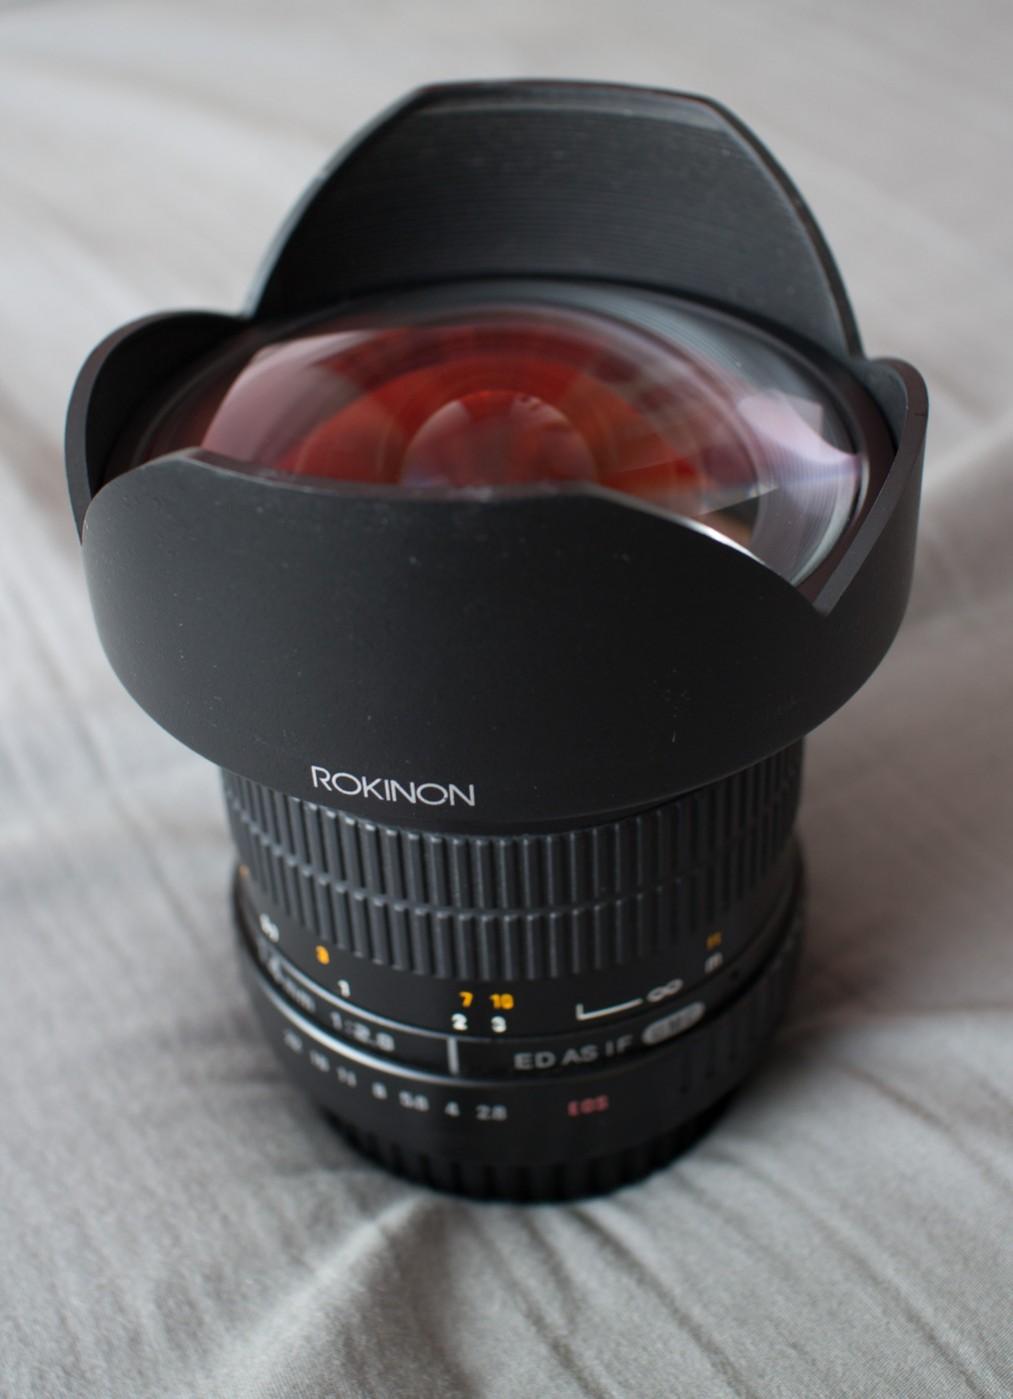 Rokinon Samyang 14mm f/2.8 IF ED UMC